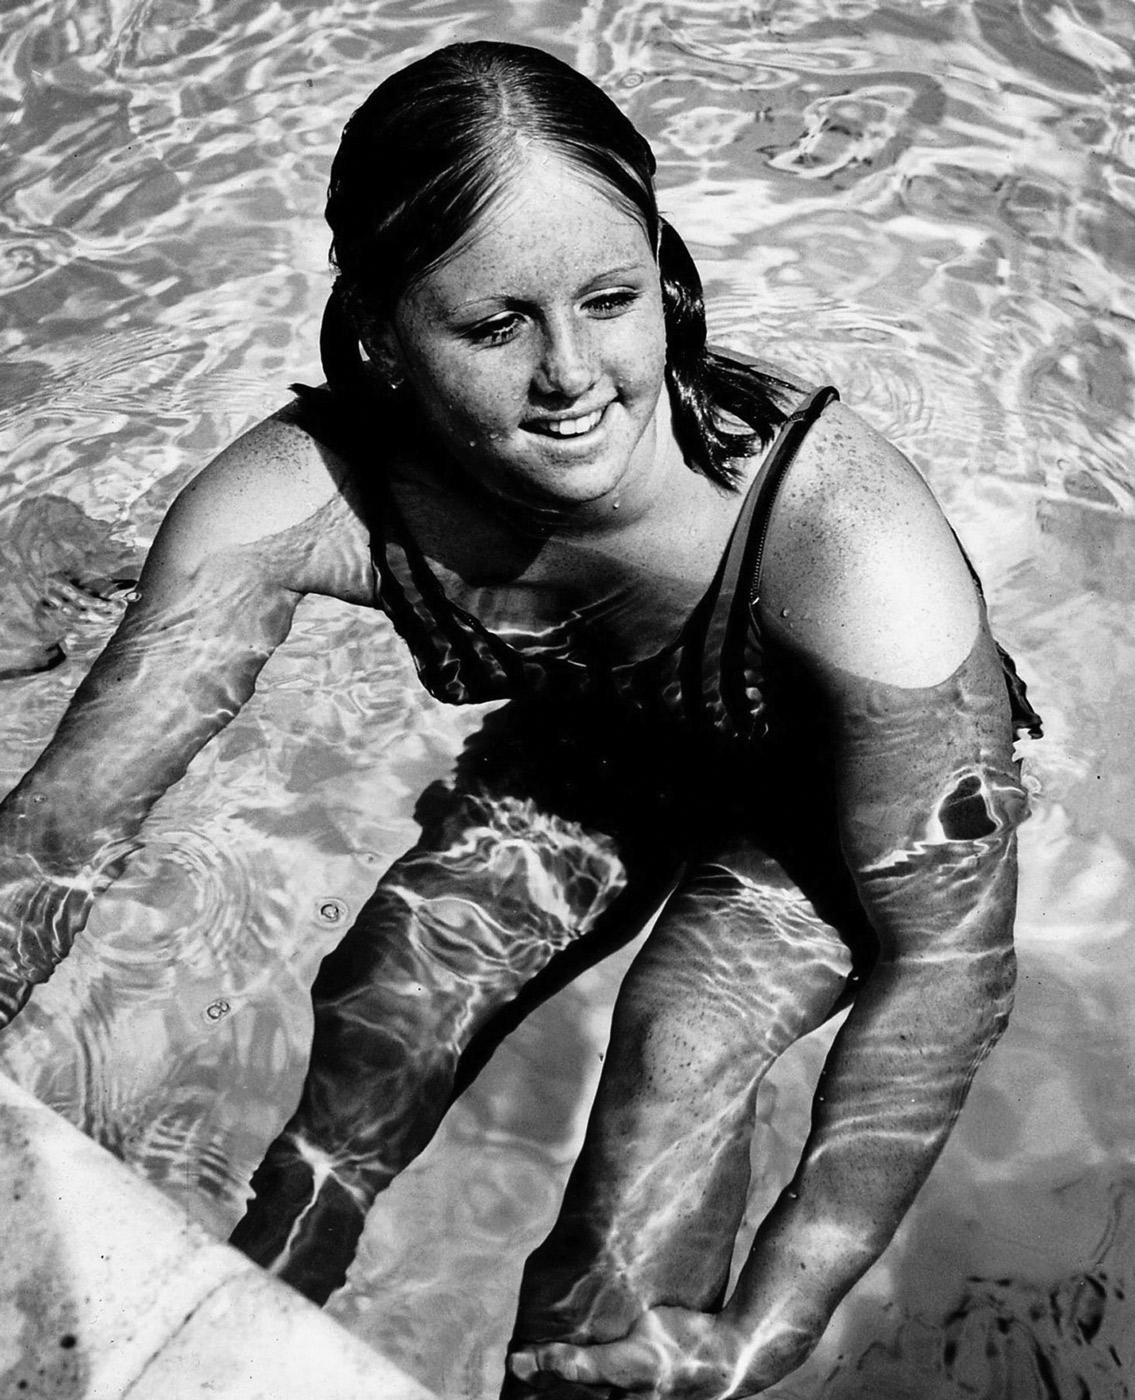 Lynn Vidali, Swimming, 1972 Olympics